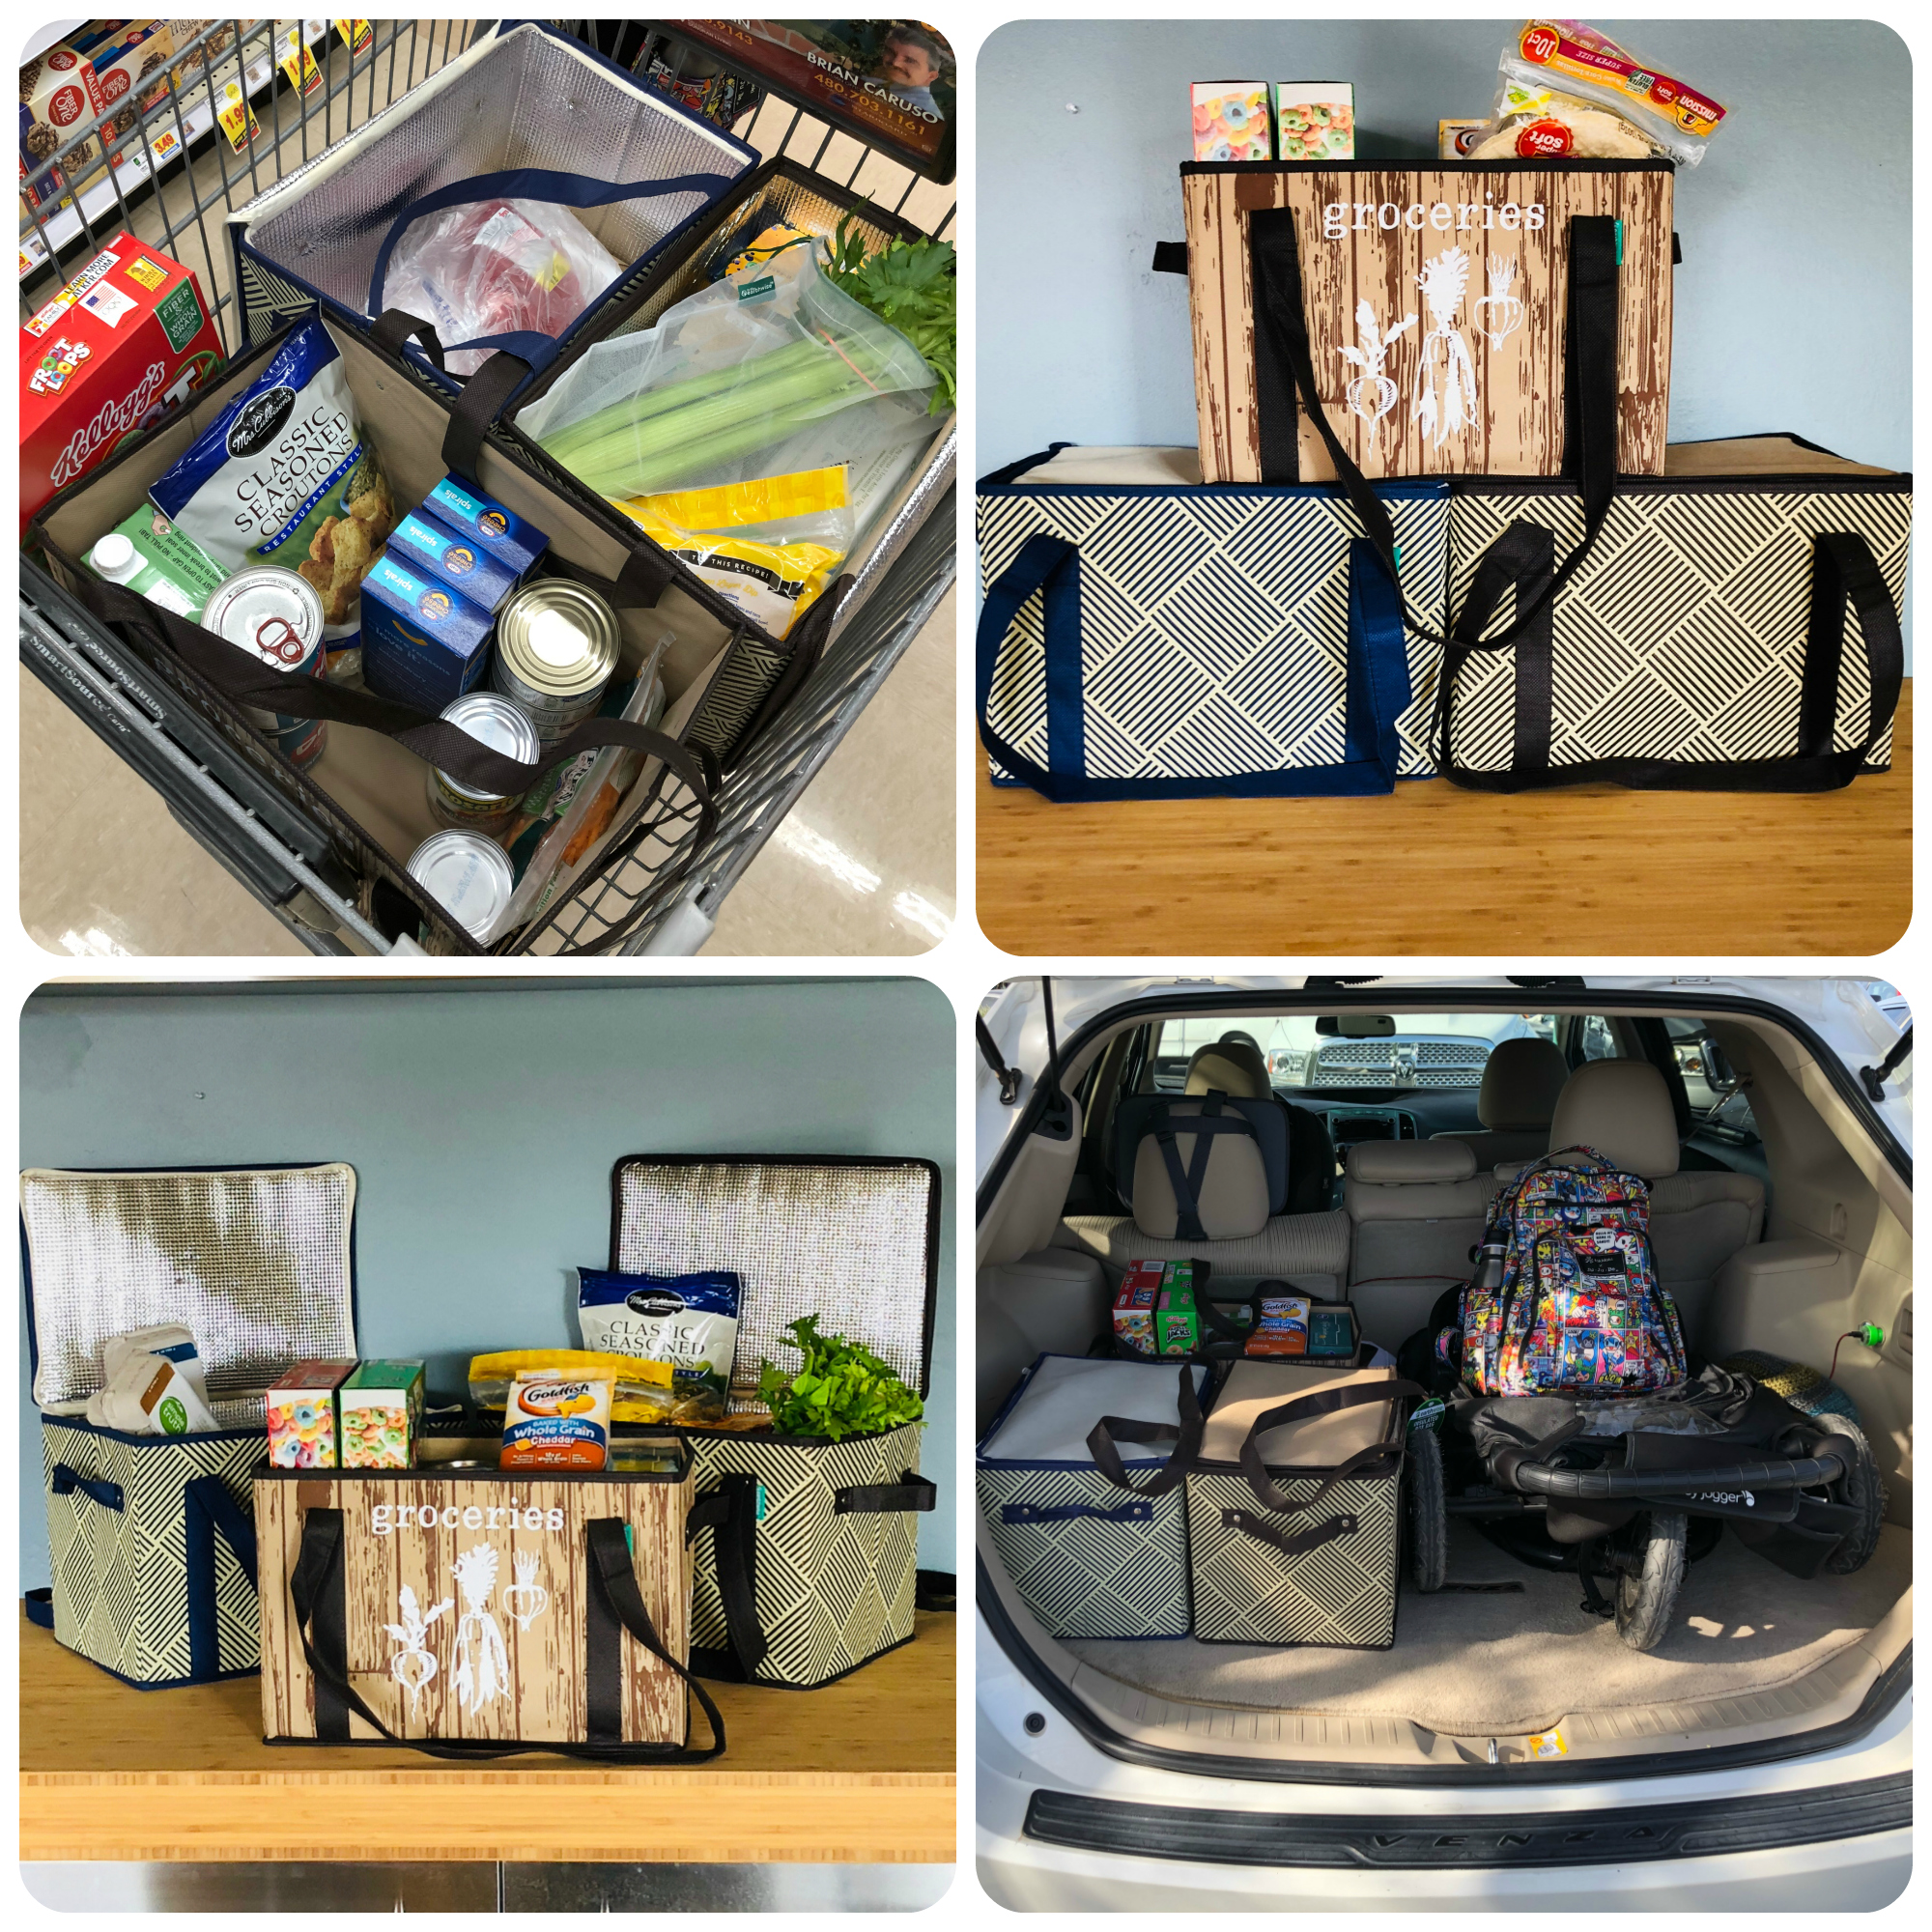 Earthwise Reusable Shopping Boxes | Reusable shopping bags | Reusable insulated shopping boxes | Reduce Reuse Recycle | Reusable Grocery Shopping | Product Review